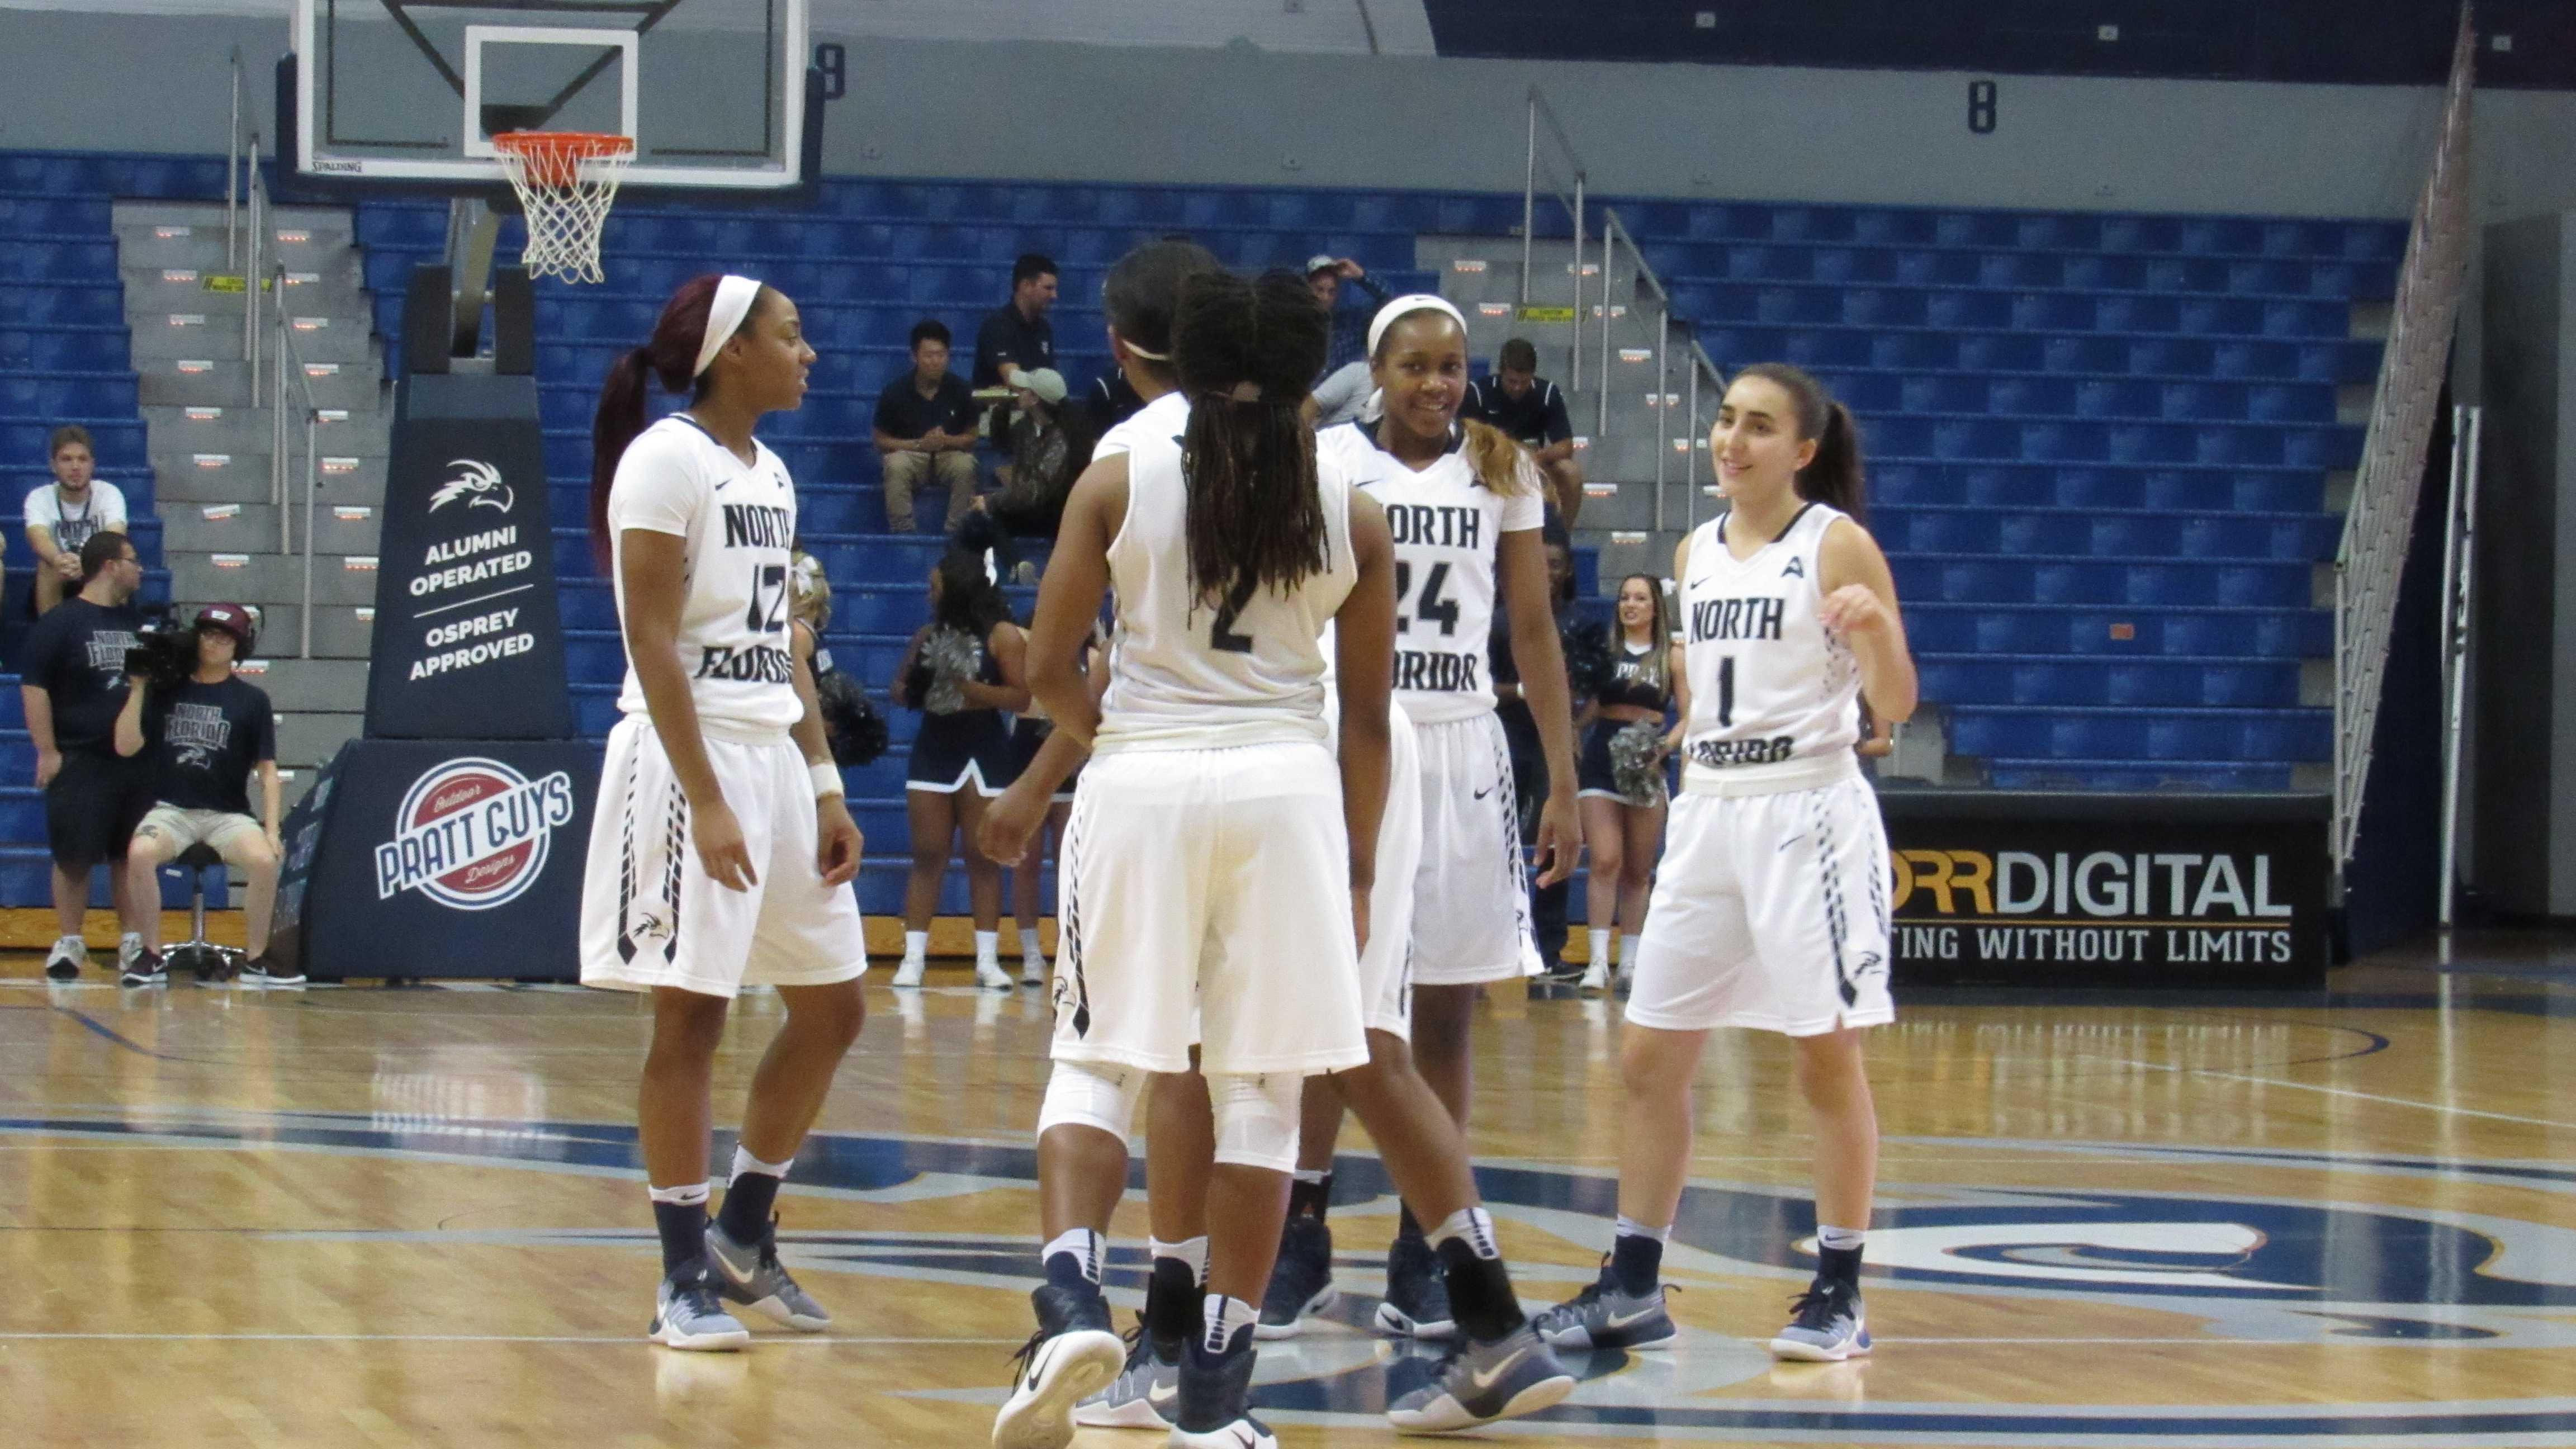 Women's basketball bounce back netting 100 points